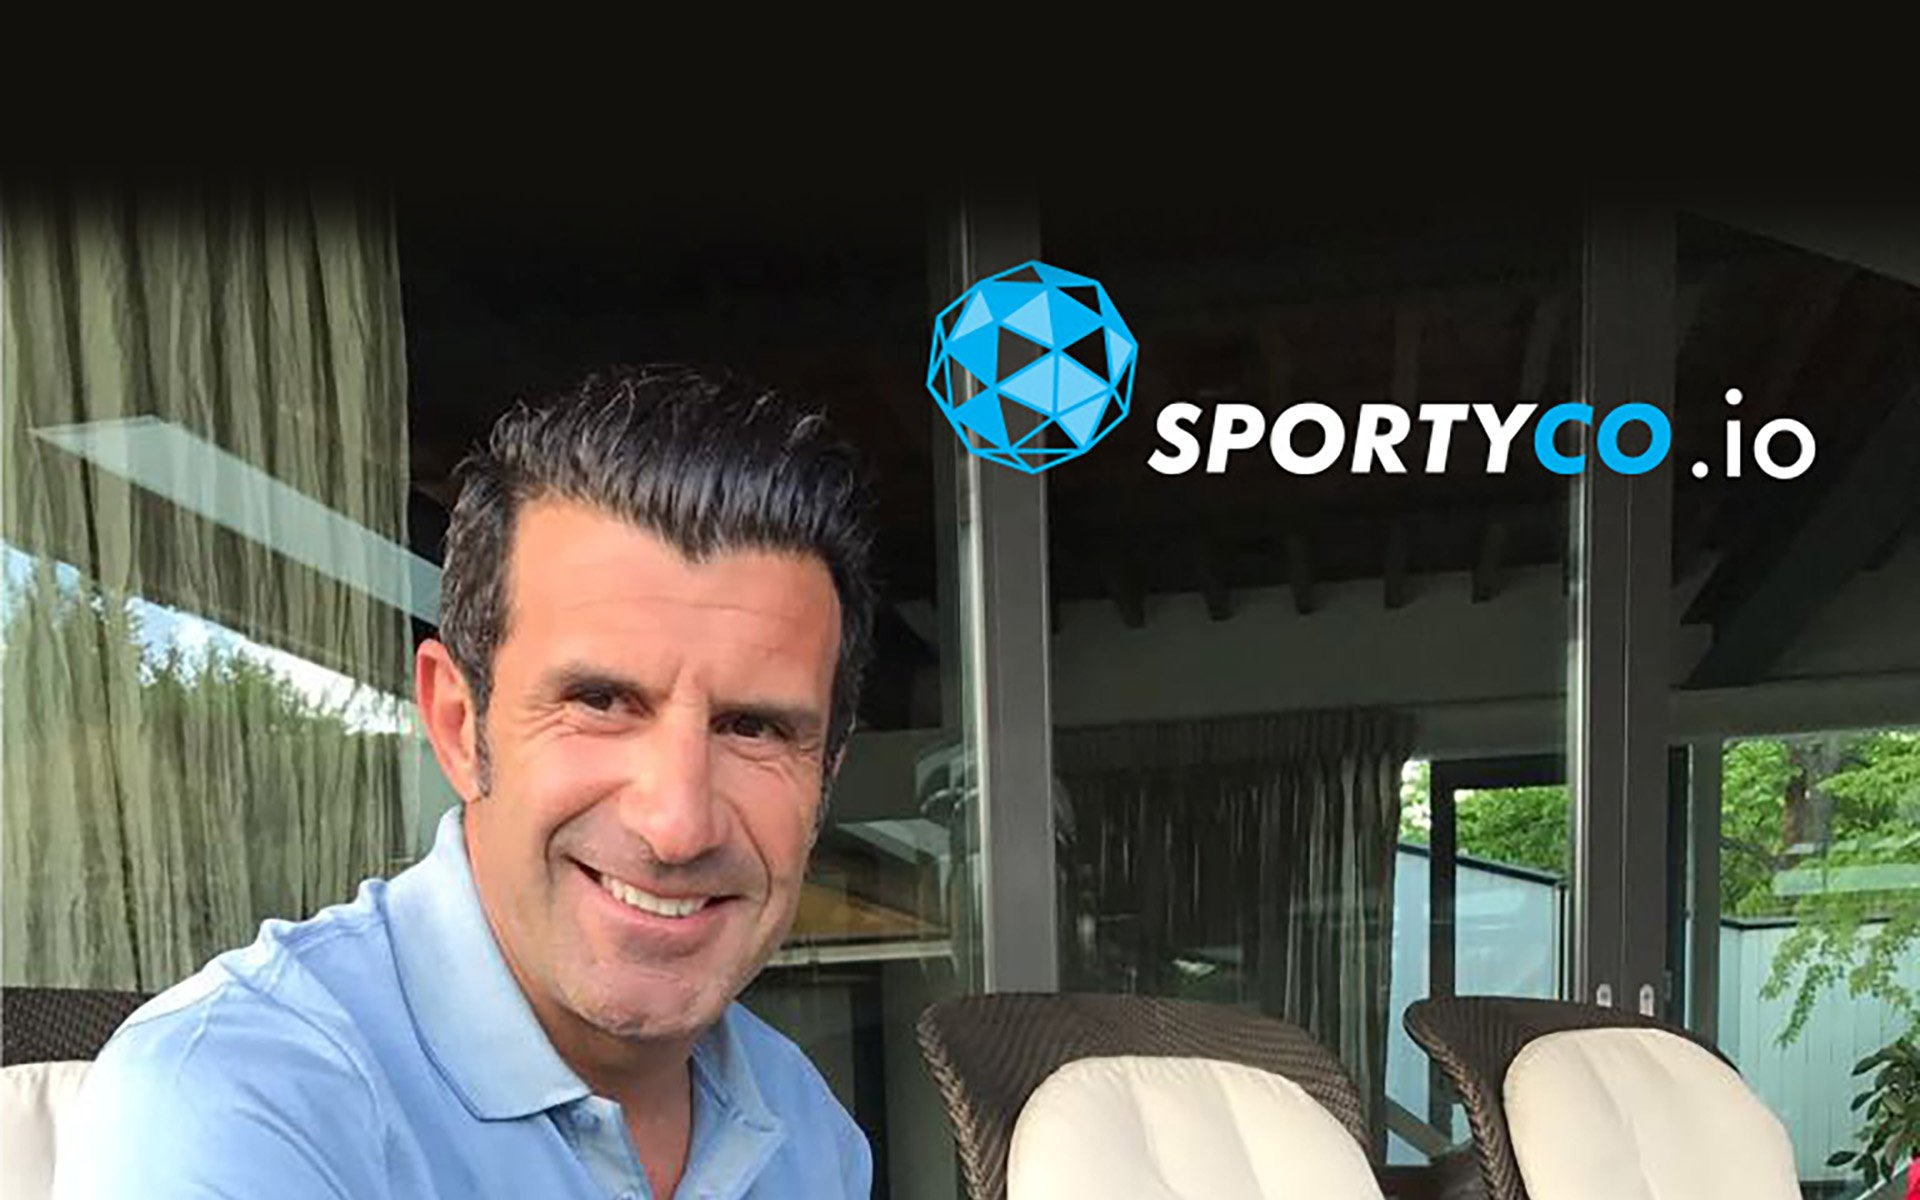 SportyCo Welcomes Luís Figo and Prepares to Host the World Sports BIockchain Summit